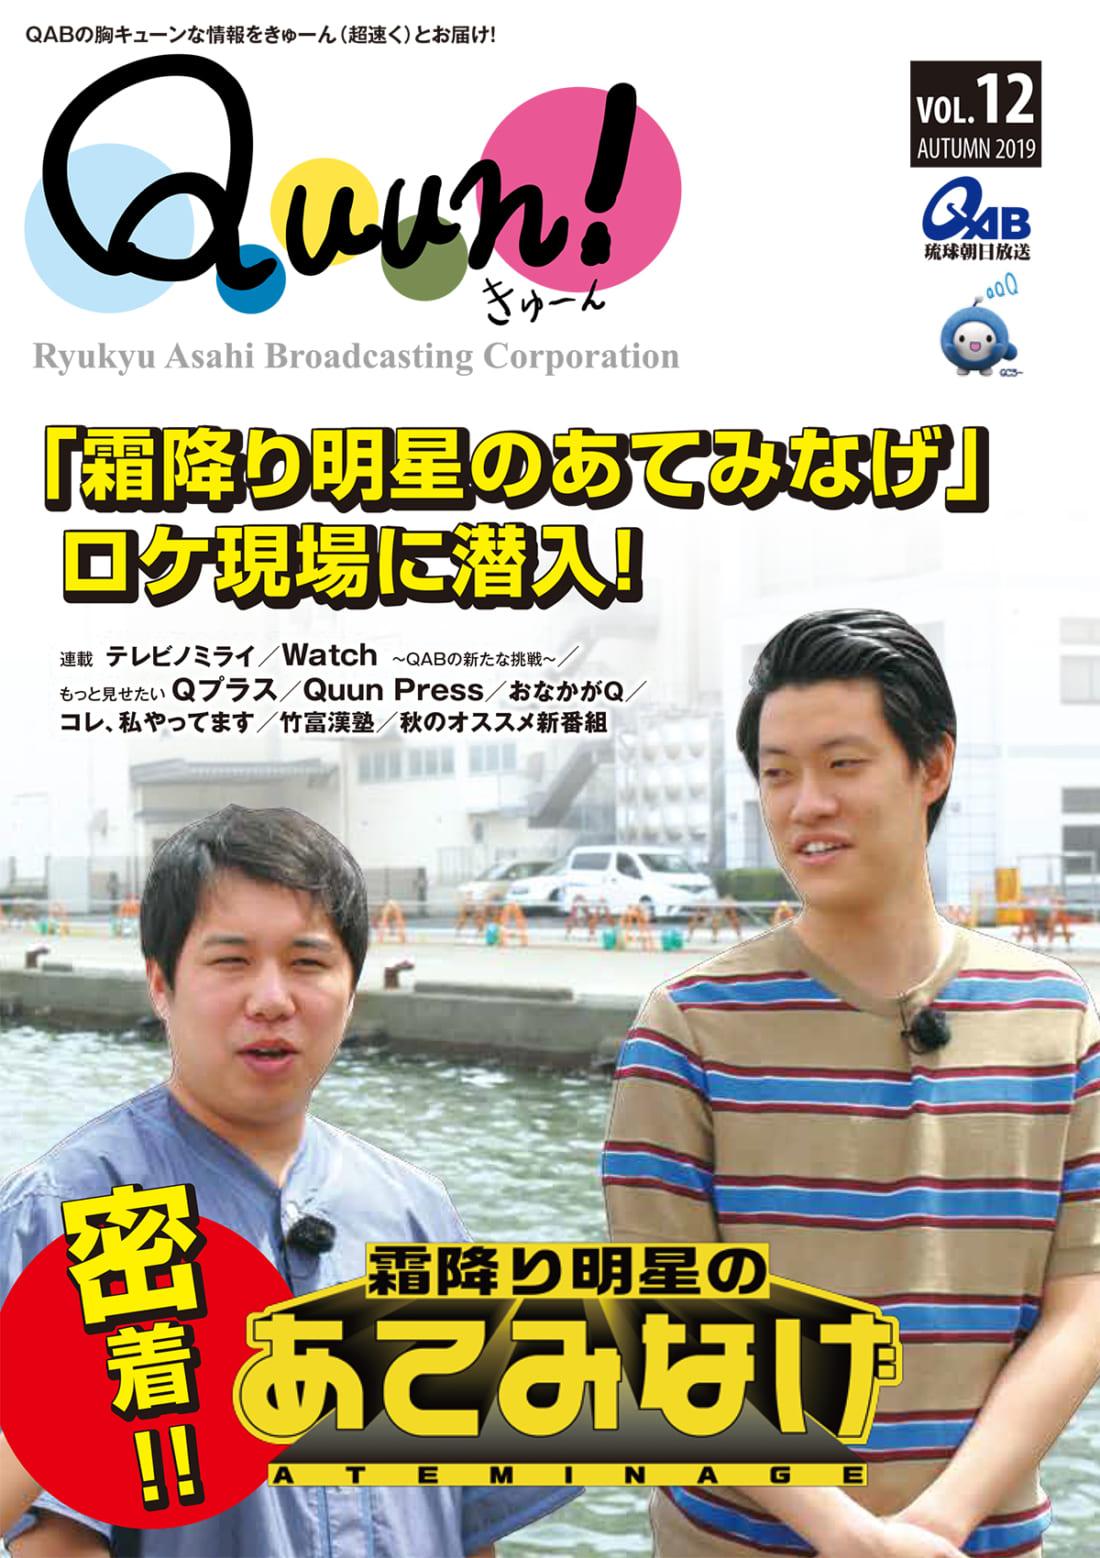 https://www.qab.co.jp/qgoro/wp-content/uploads/quun_1201-1100x1558.jpg